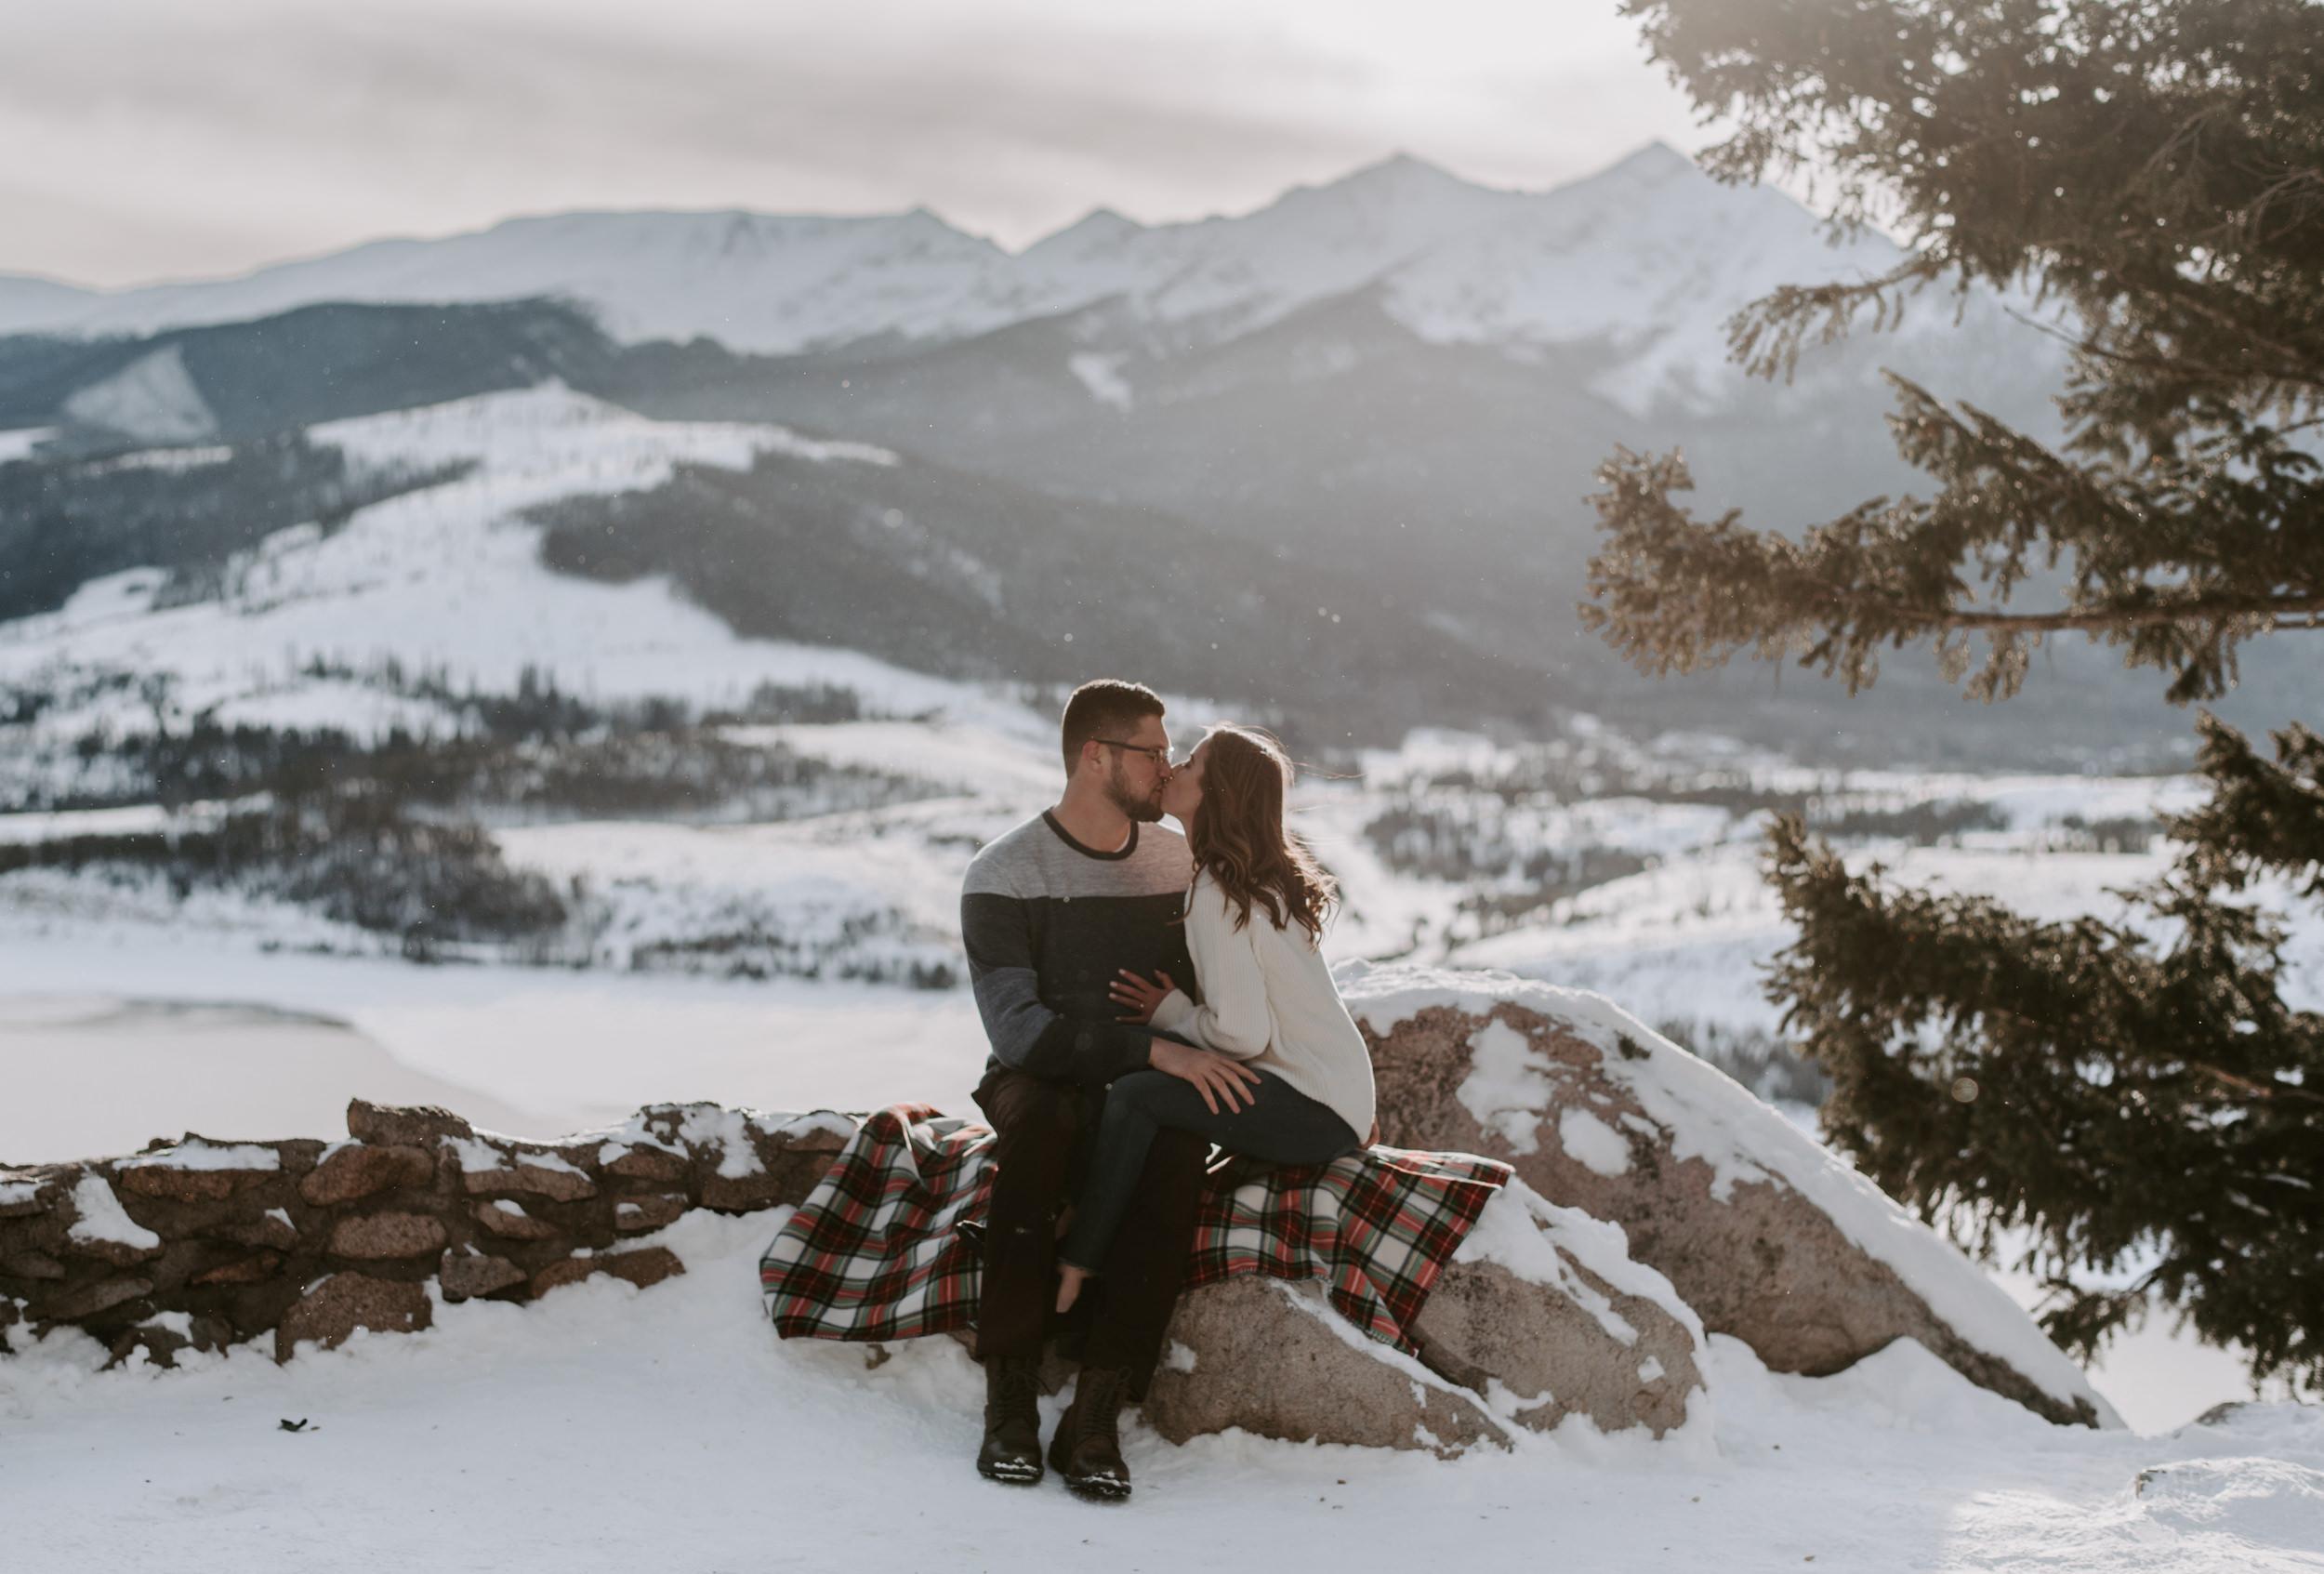 Colorado mountain engagement session in Breckenridge, Colorado. Sapphire Point Overlook engagement photos. Colorado wedding and elopement photographer, Alyssa Reinhold.